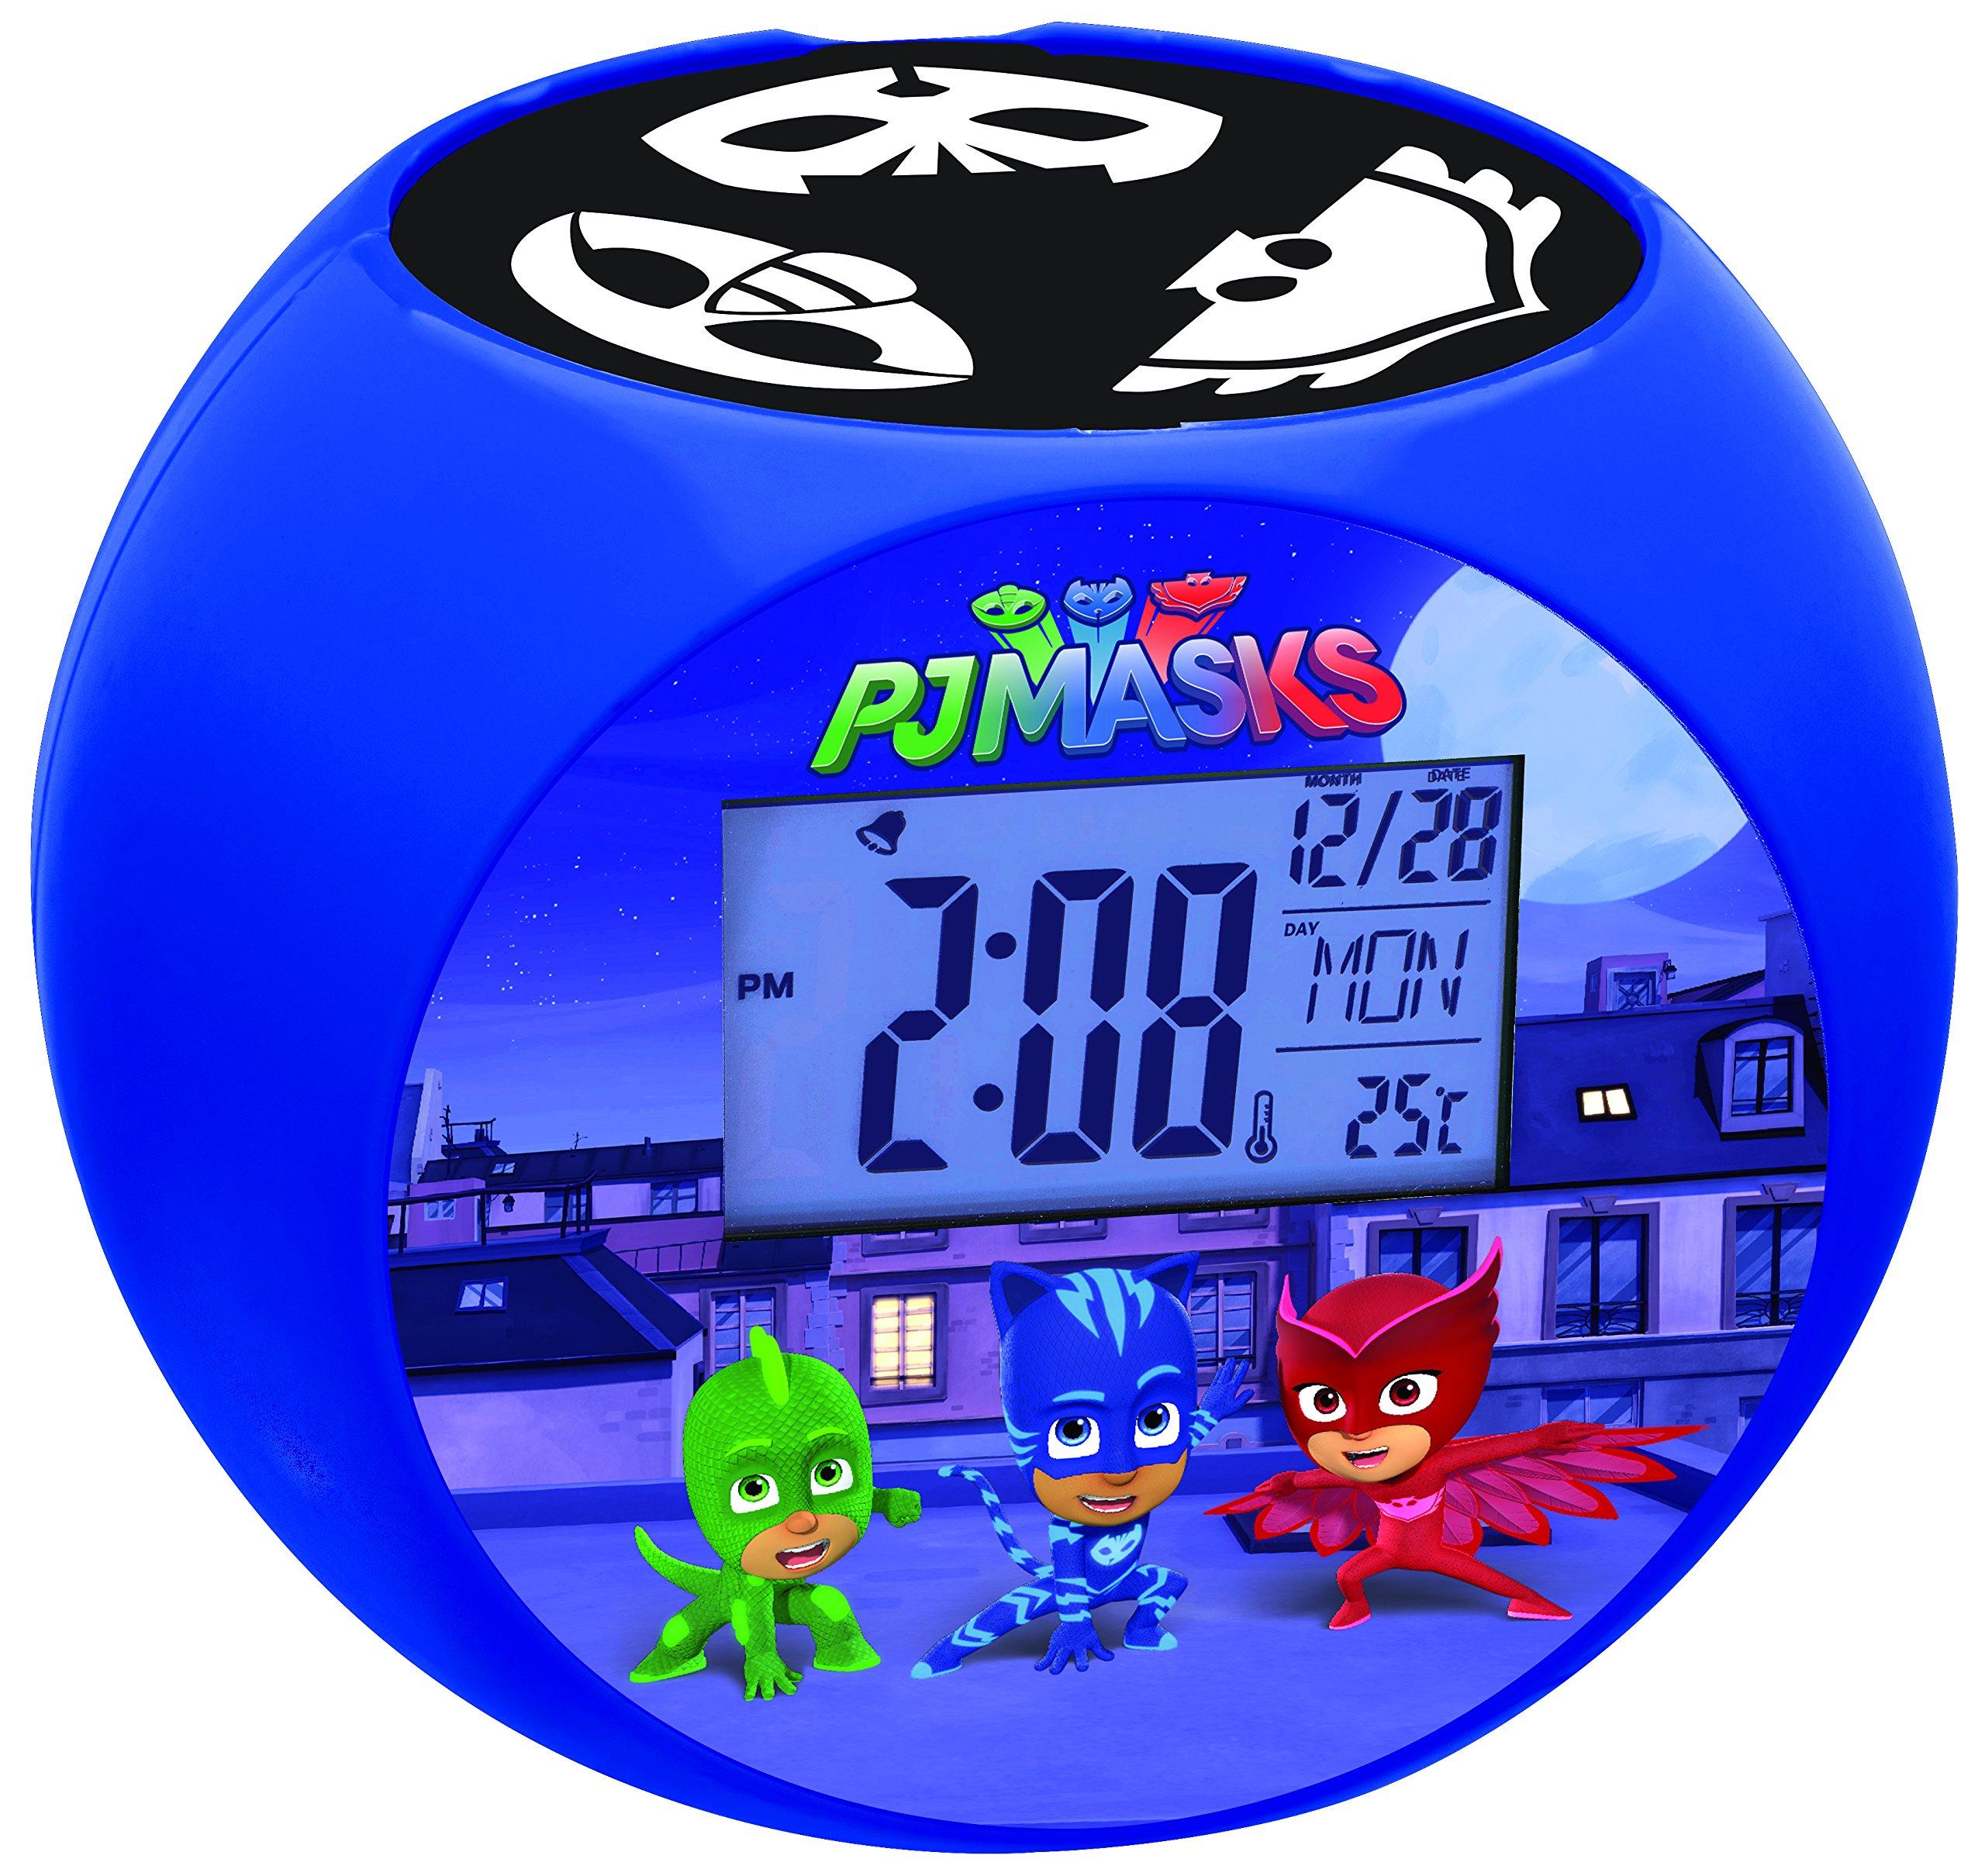 Lexibook PJ Masks Catboy Radio Projector Clock, Sound Effects, Battery-Powered, Blue/Black, RL975PJM by Lexibook